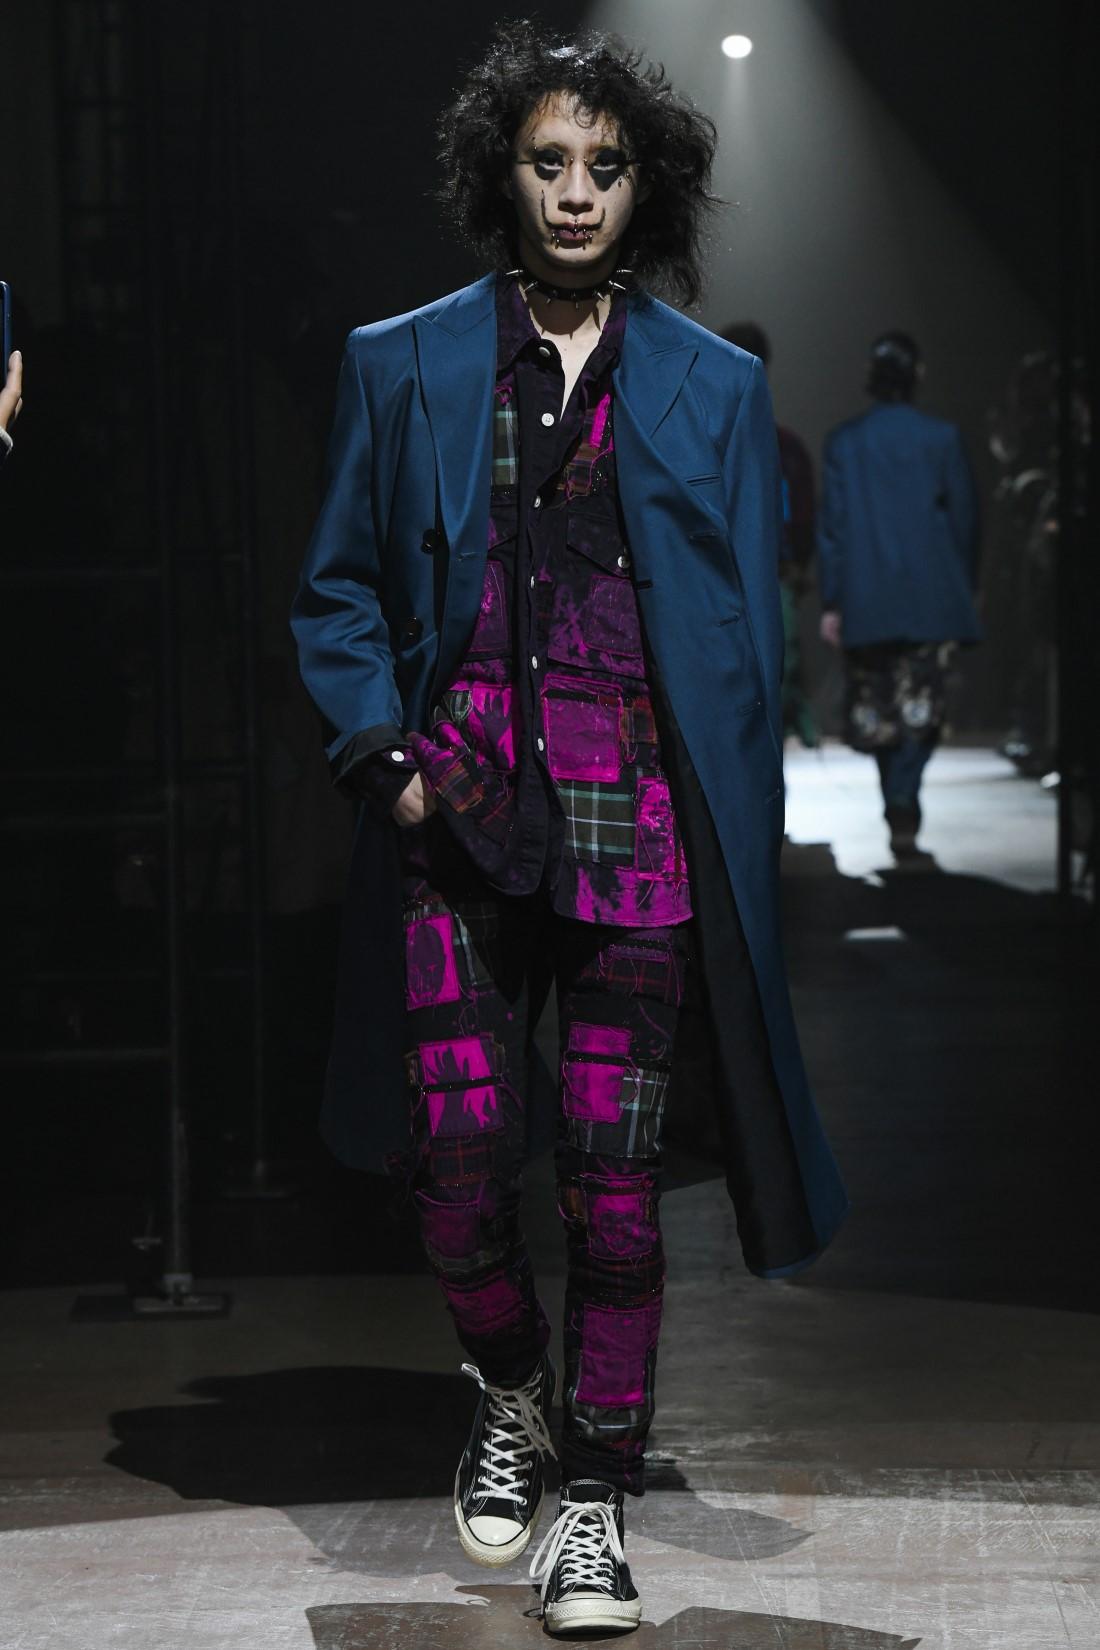 KIDILL - Automne-Hiver 2021 - Paris Fashion Week